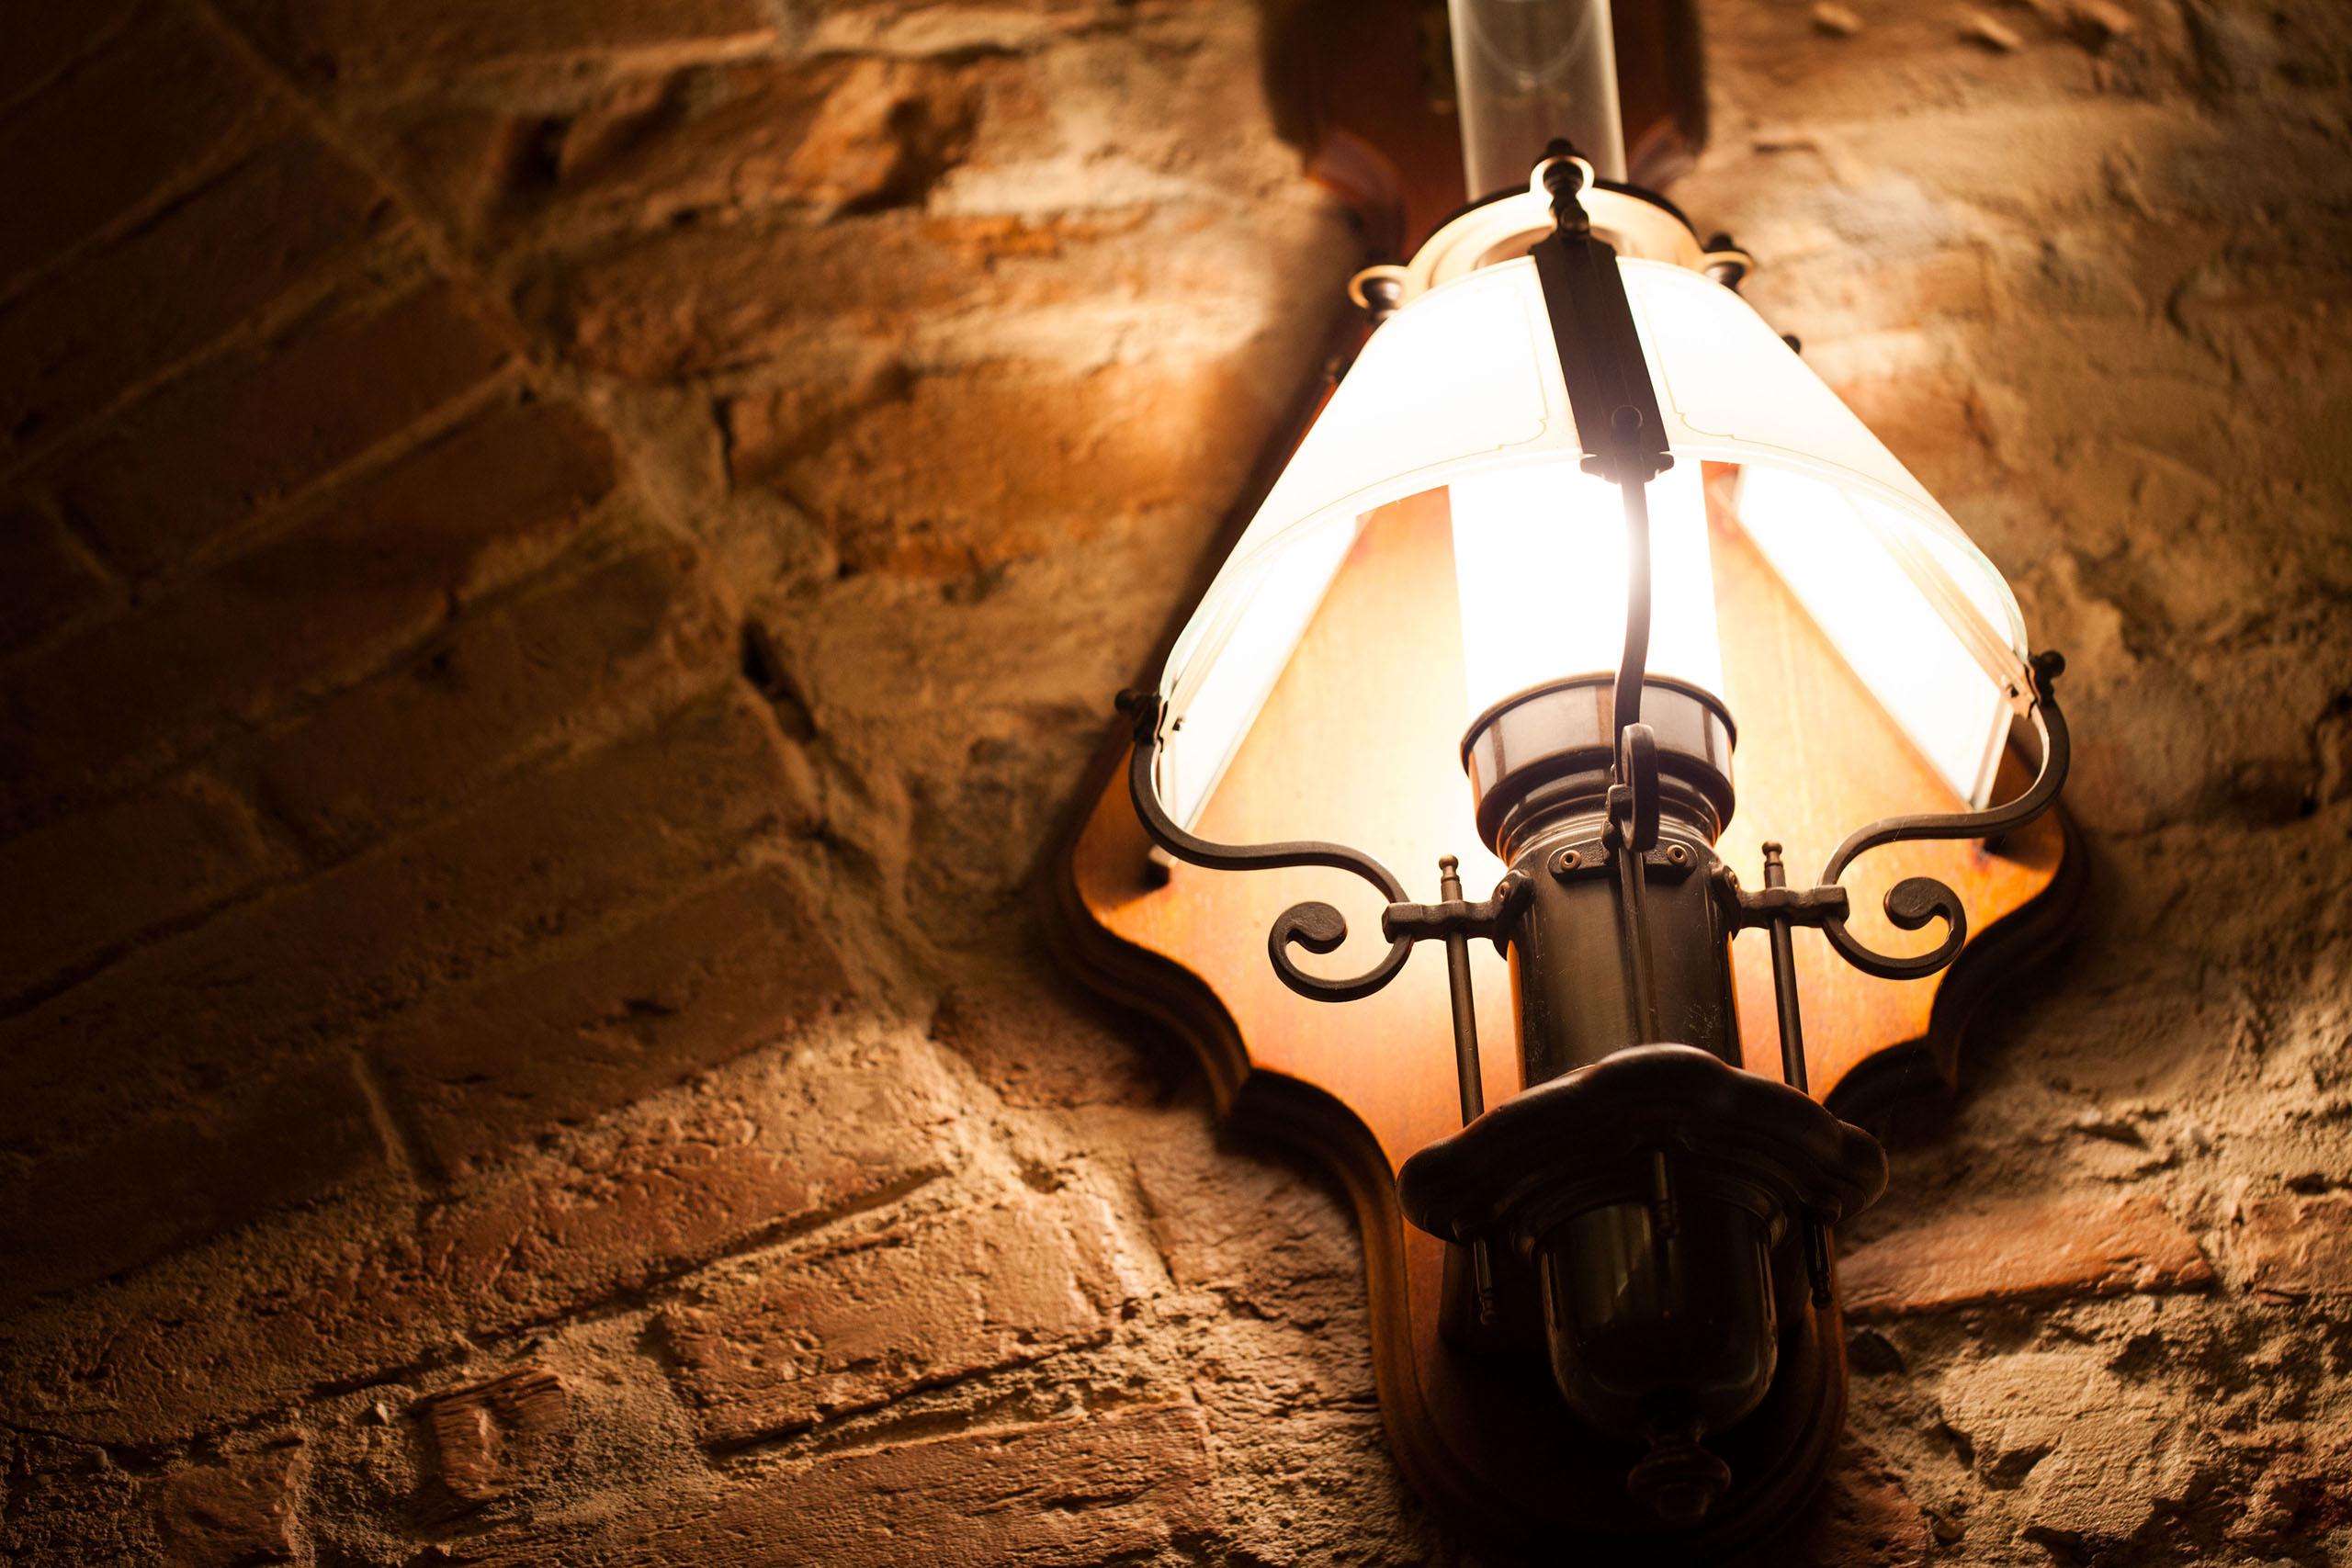 Ceiling Lights & Fans Back To Search Resultslights & Lighting Logical Zerouno Led Ceiling Light Surface Mount Flush Panel Modern Lamp Living Room Lighting Fixture Bedroom Kitchen Mirror Bathroom